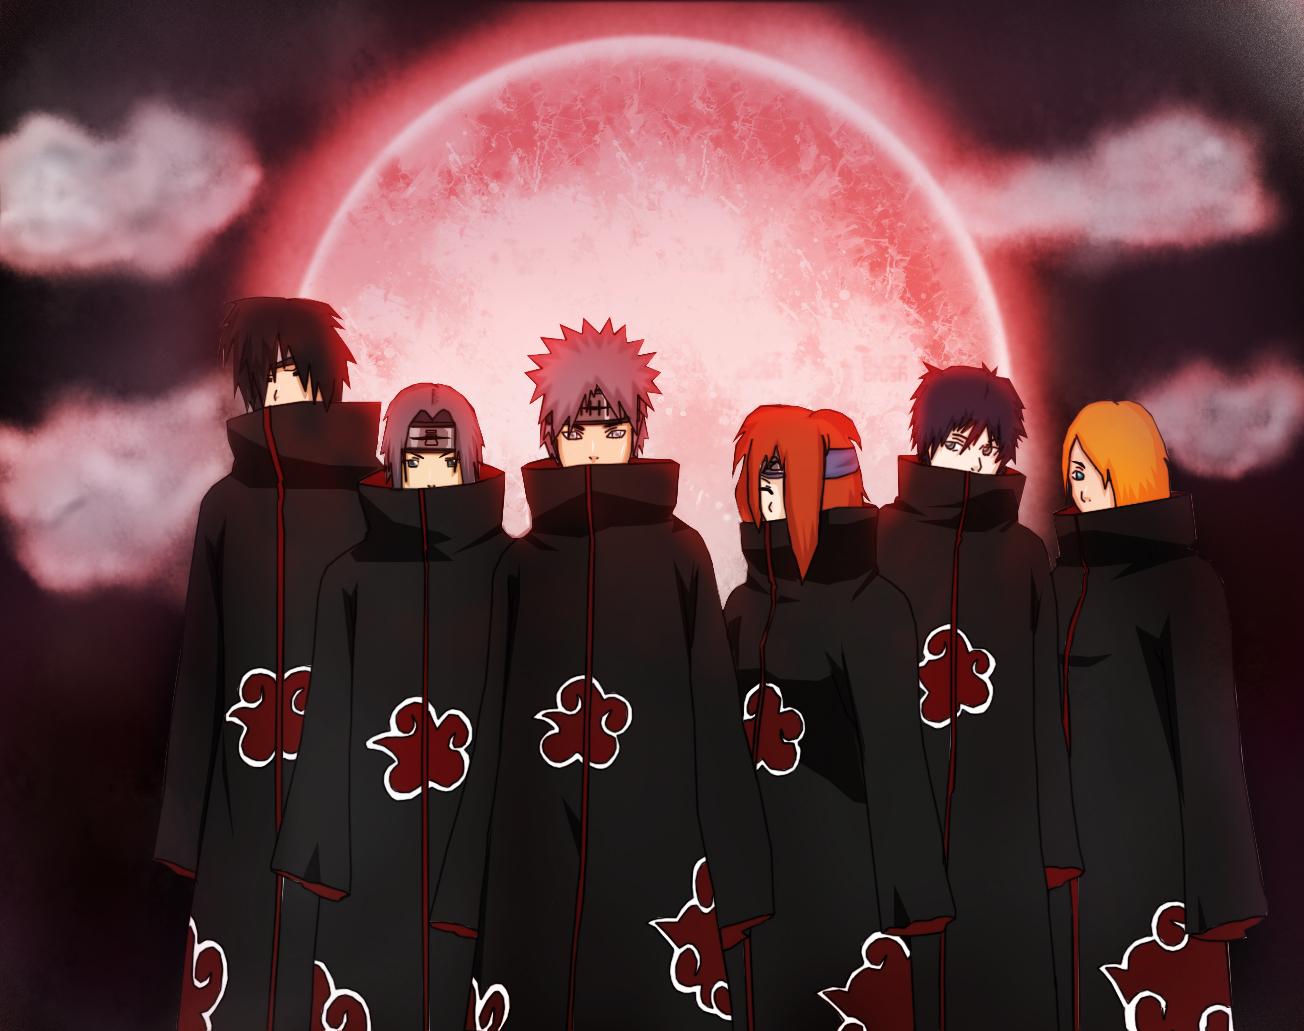 akatsuki todos los miembros